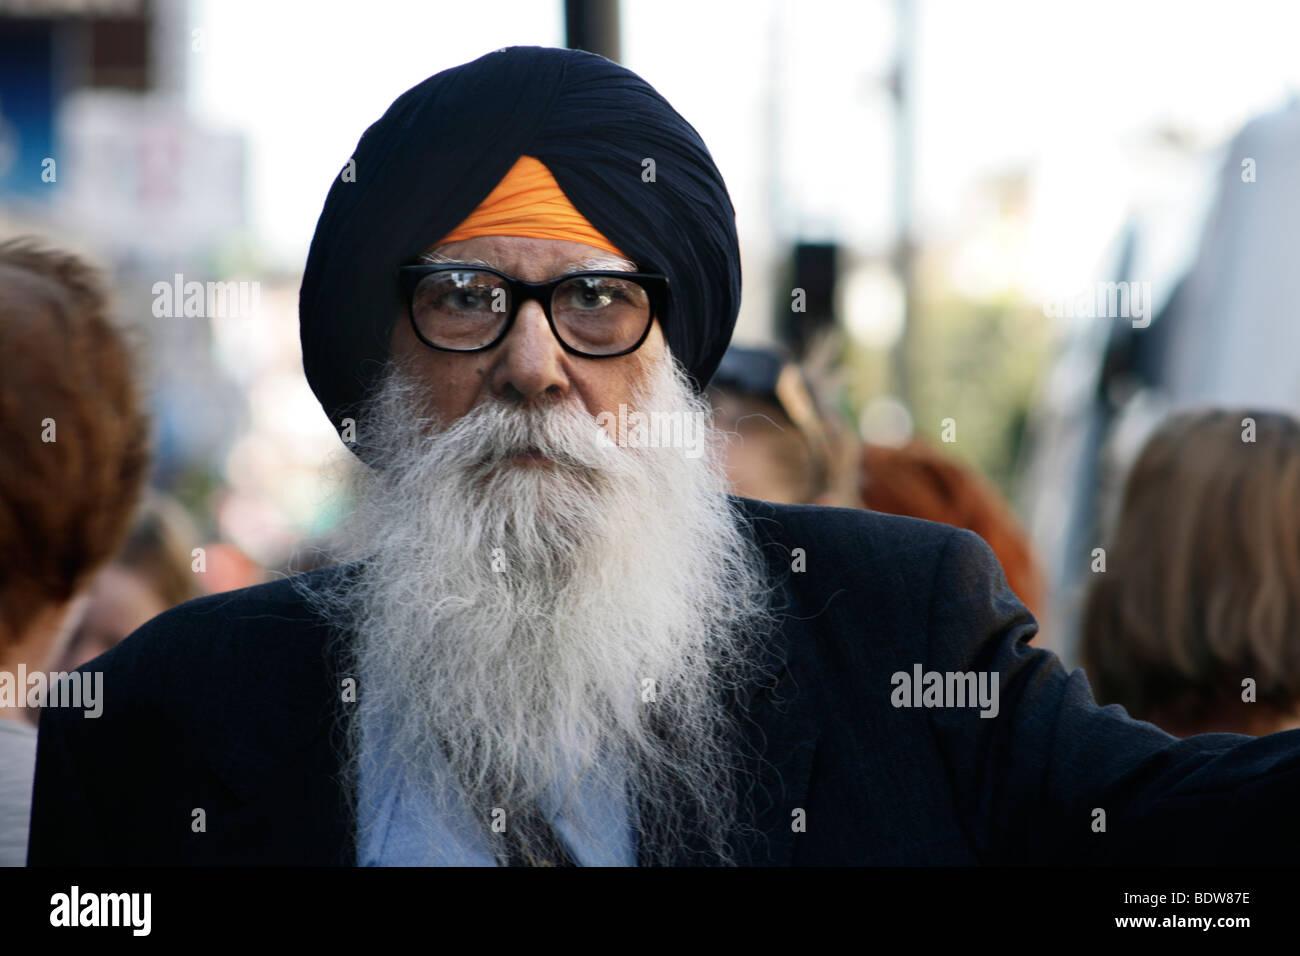 a Hinduist man walk around London - Stock Image